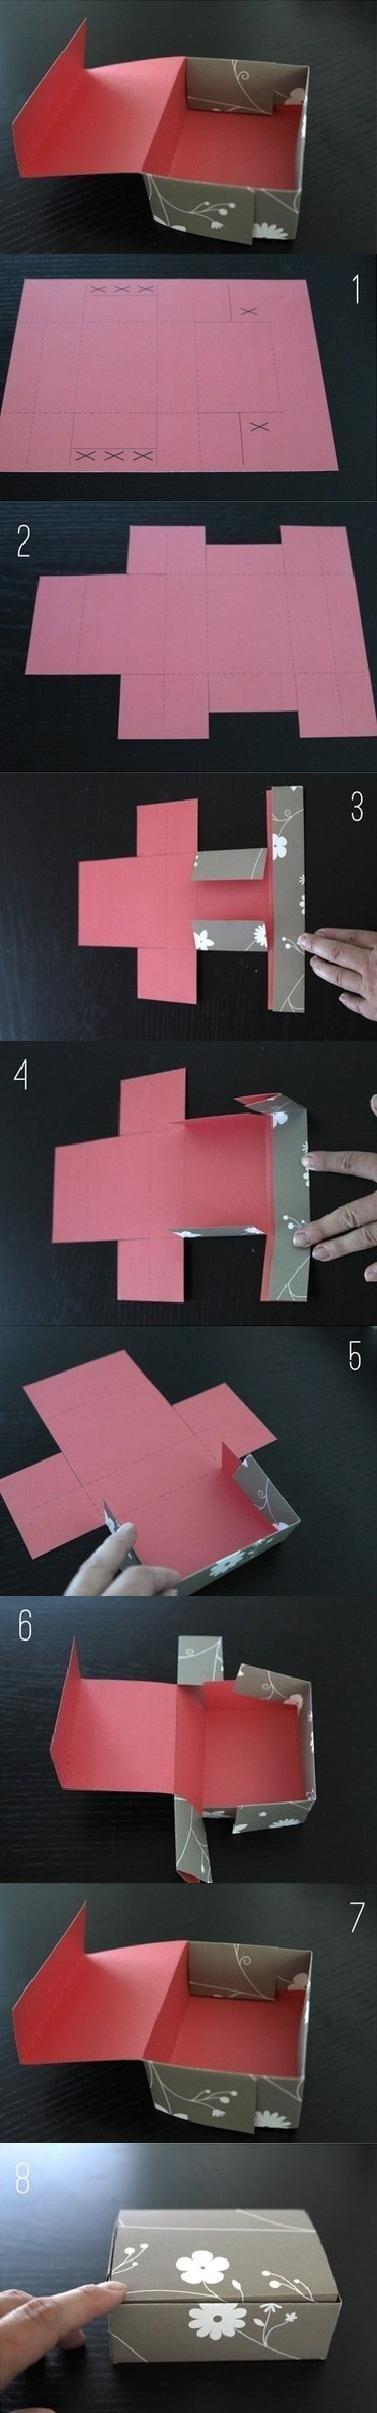 DIY Simple Gift Box DIY Projects / UsefulDIY.com